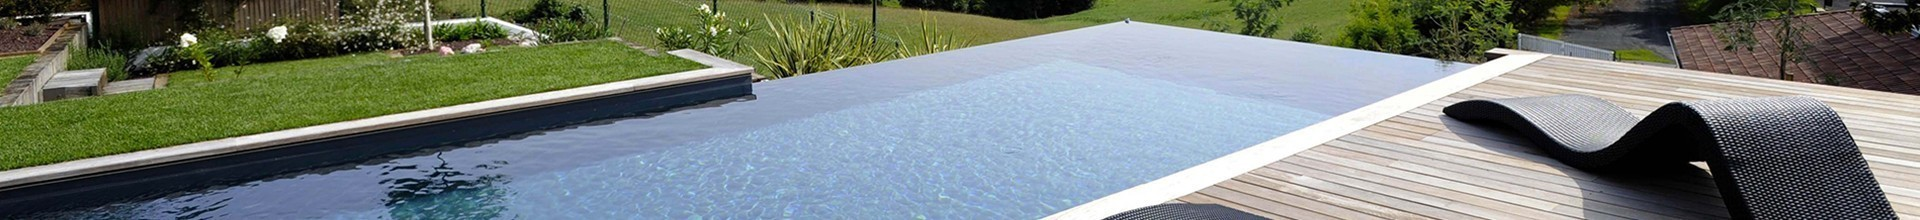 Direct usine, piscine coque prix Haute-Vienne